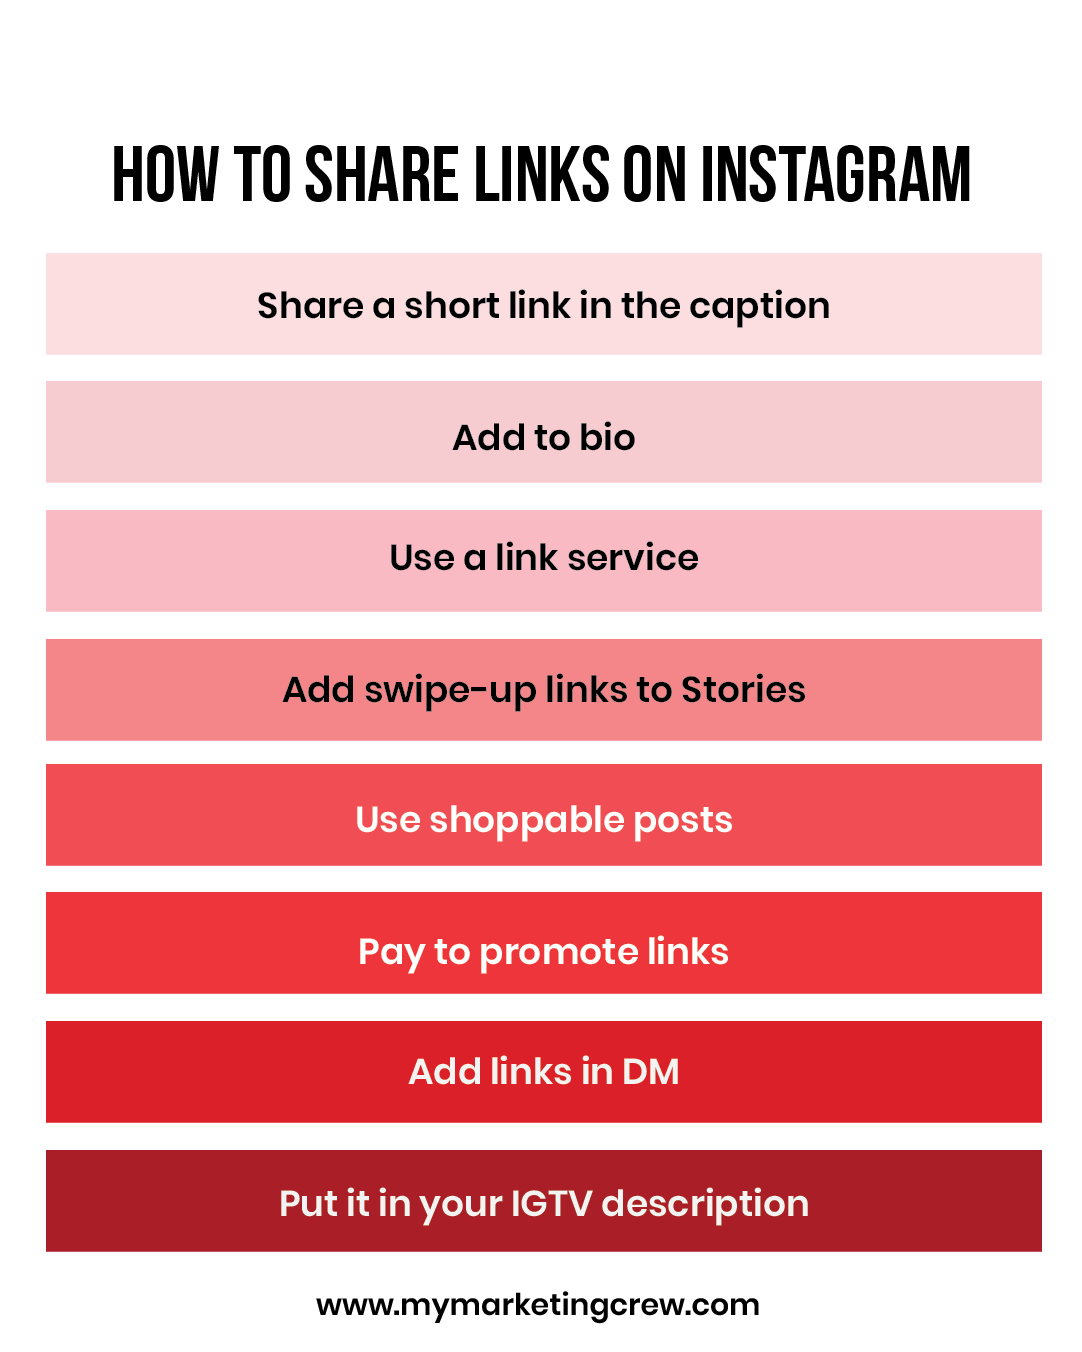 How To Share Links On Instagram In 2020 Social Media Blogging Secrets Social Media Resources